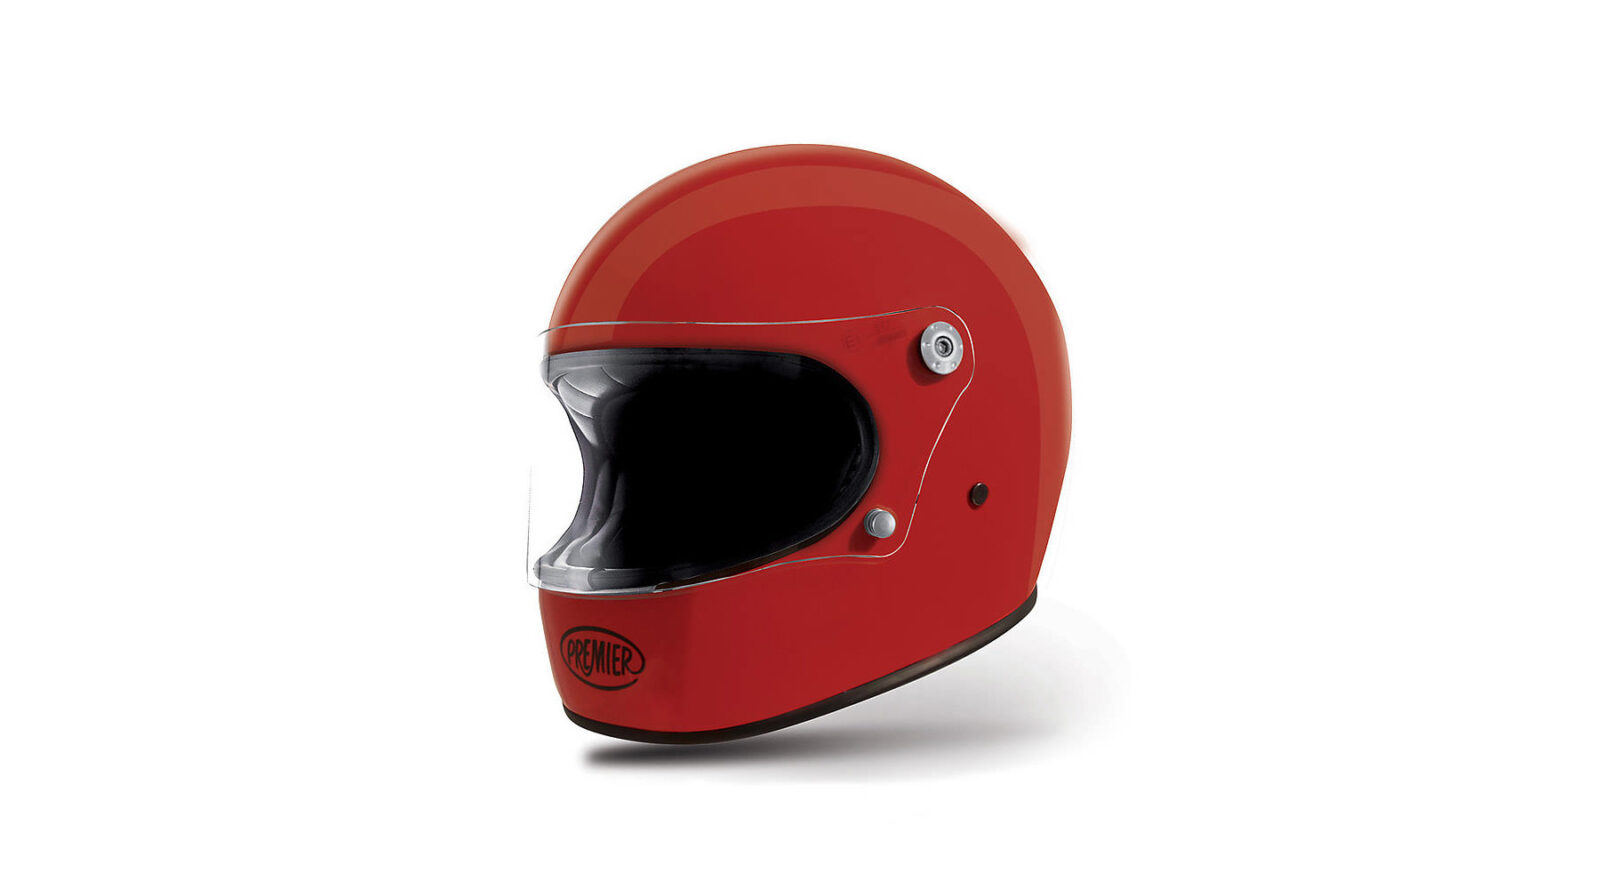 Premier Trophy Helmet 1600x889 - Premier Trophy Helmet